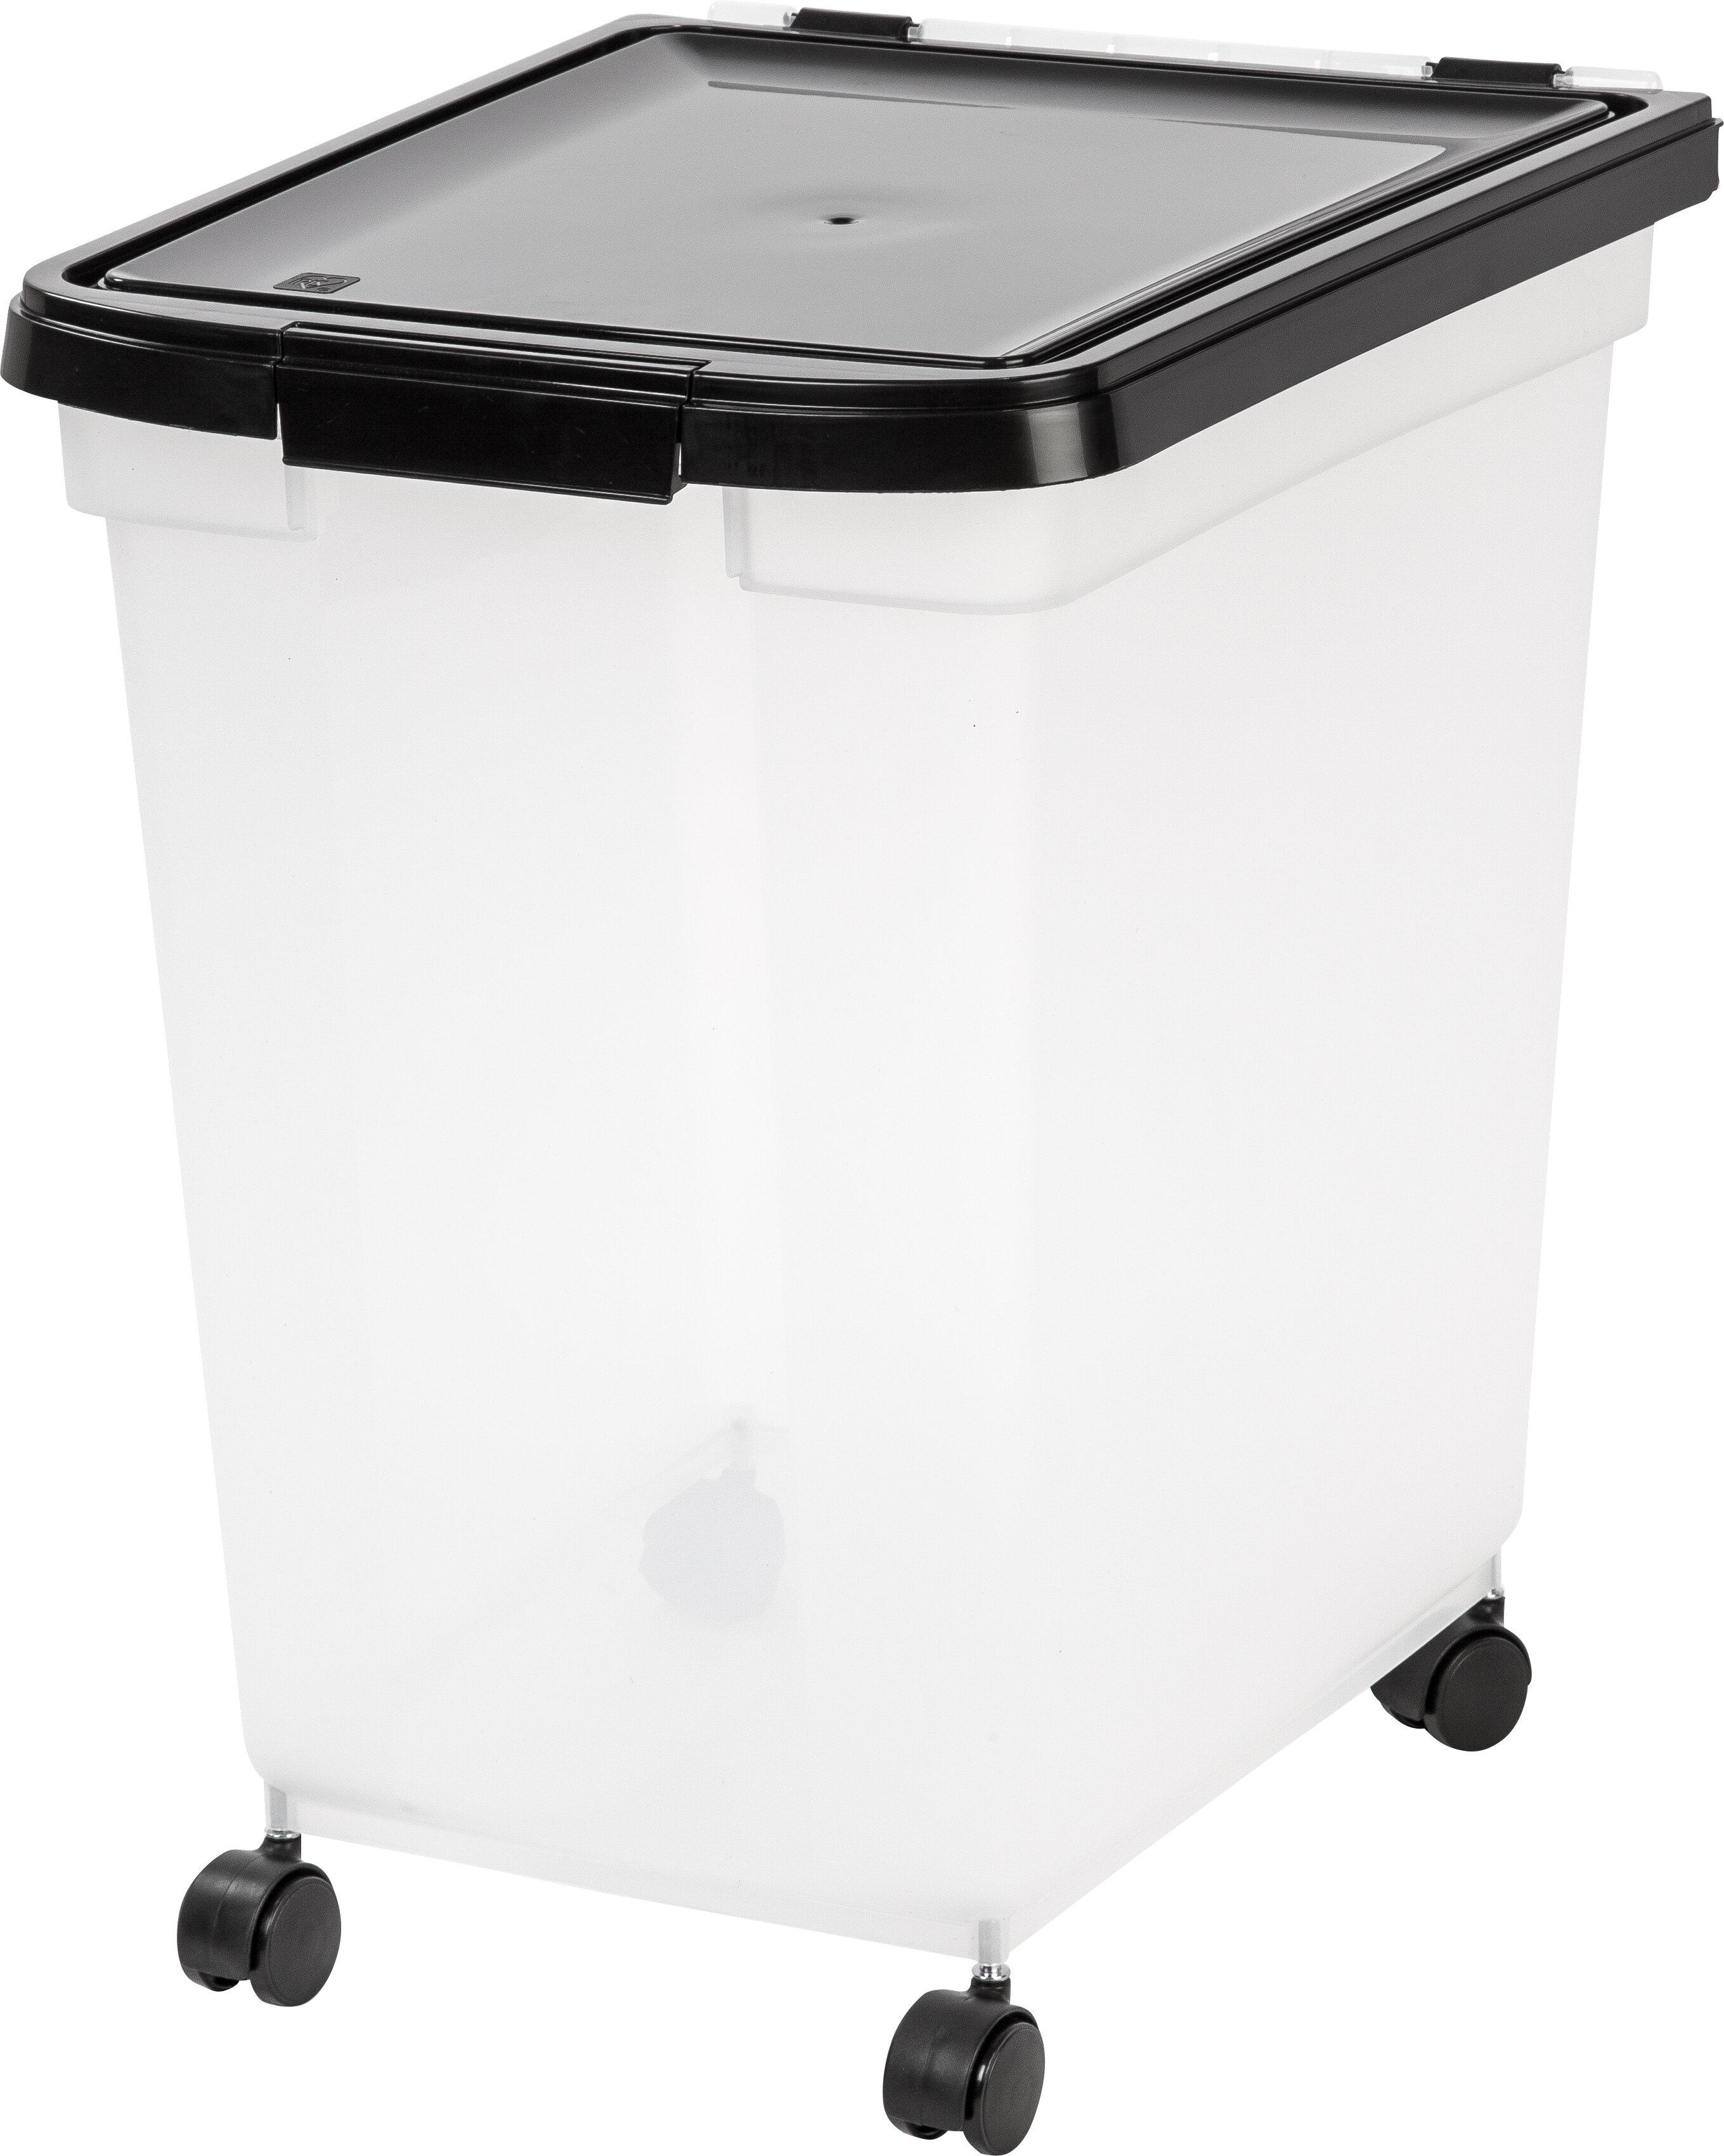 Food Storage Container U0026 Reviews | Wayfair